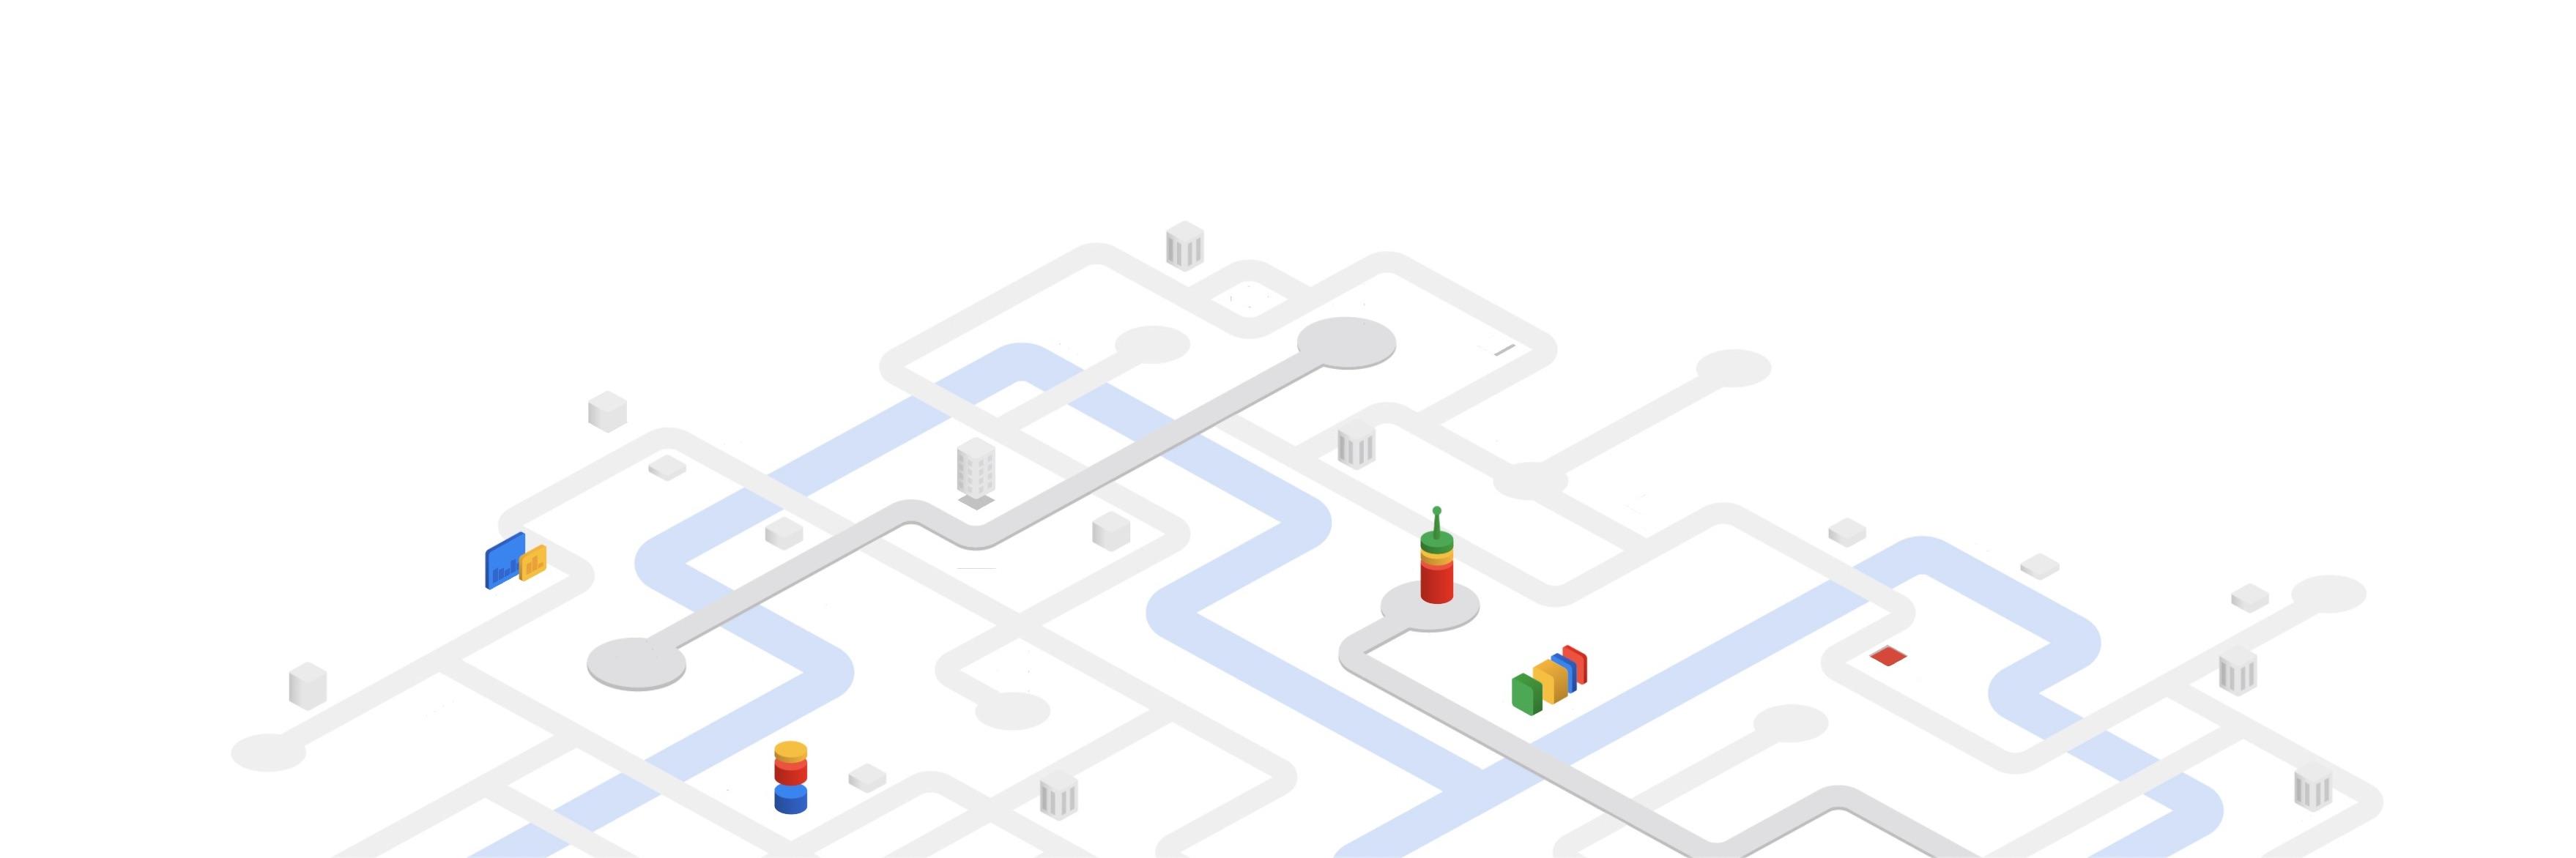 Google Cloud Next OnAir graphic